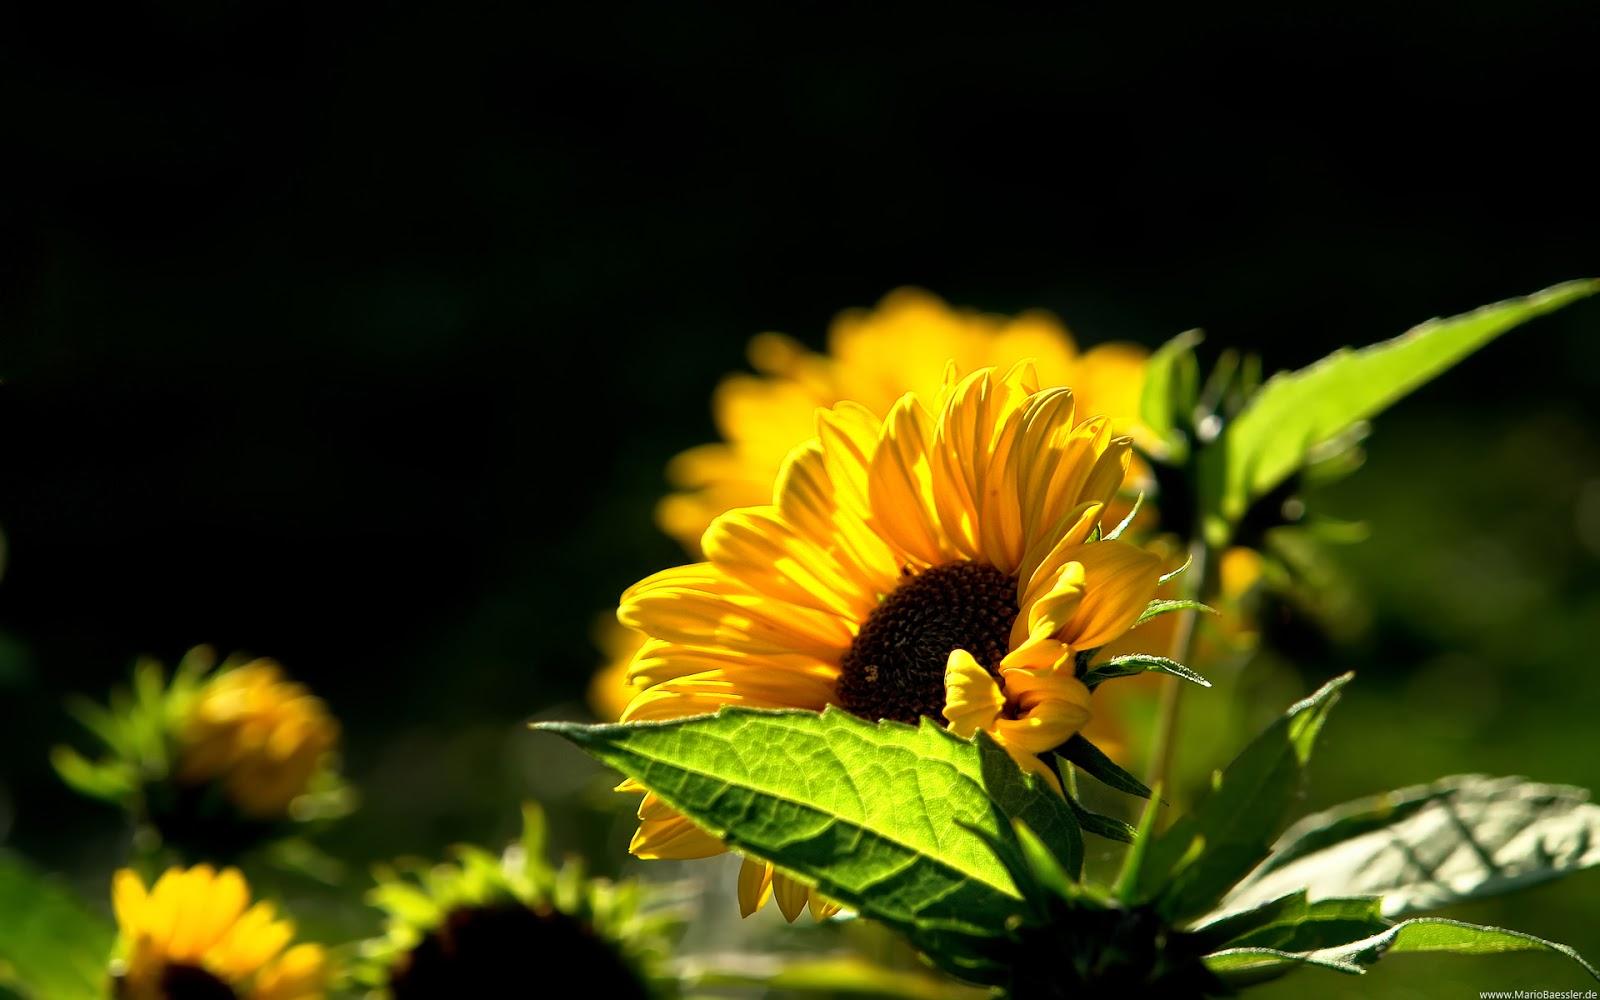 Sunflower Wallpaper Desktop - Mobile wallpapers